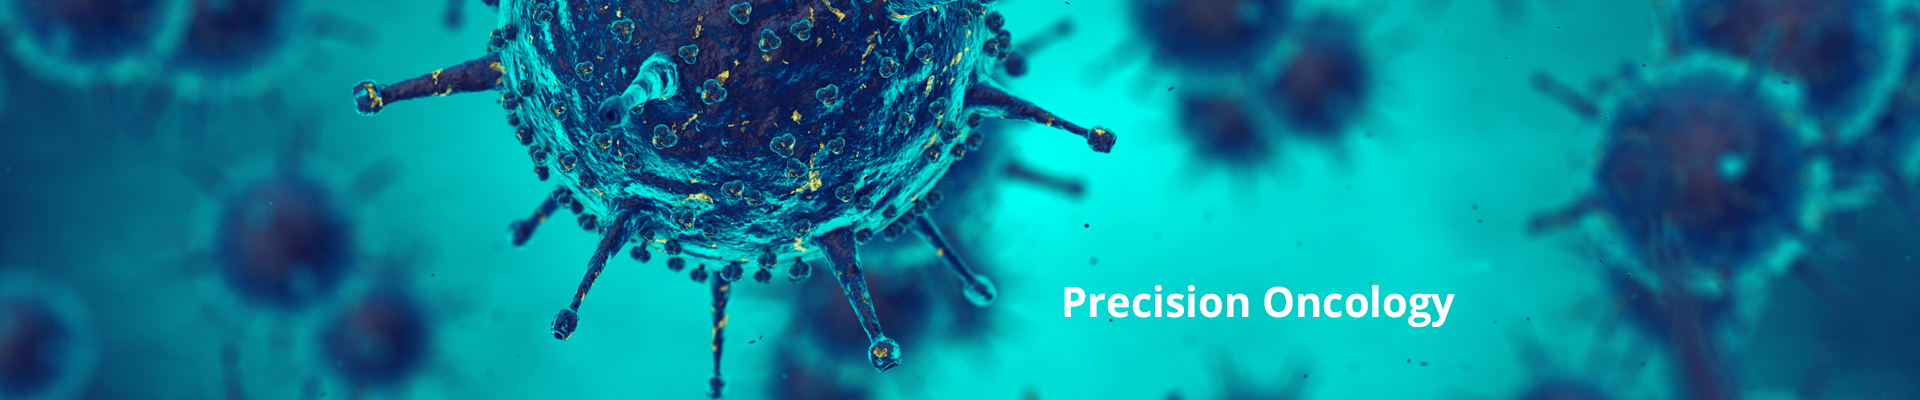 Precision-Oncology-V2